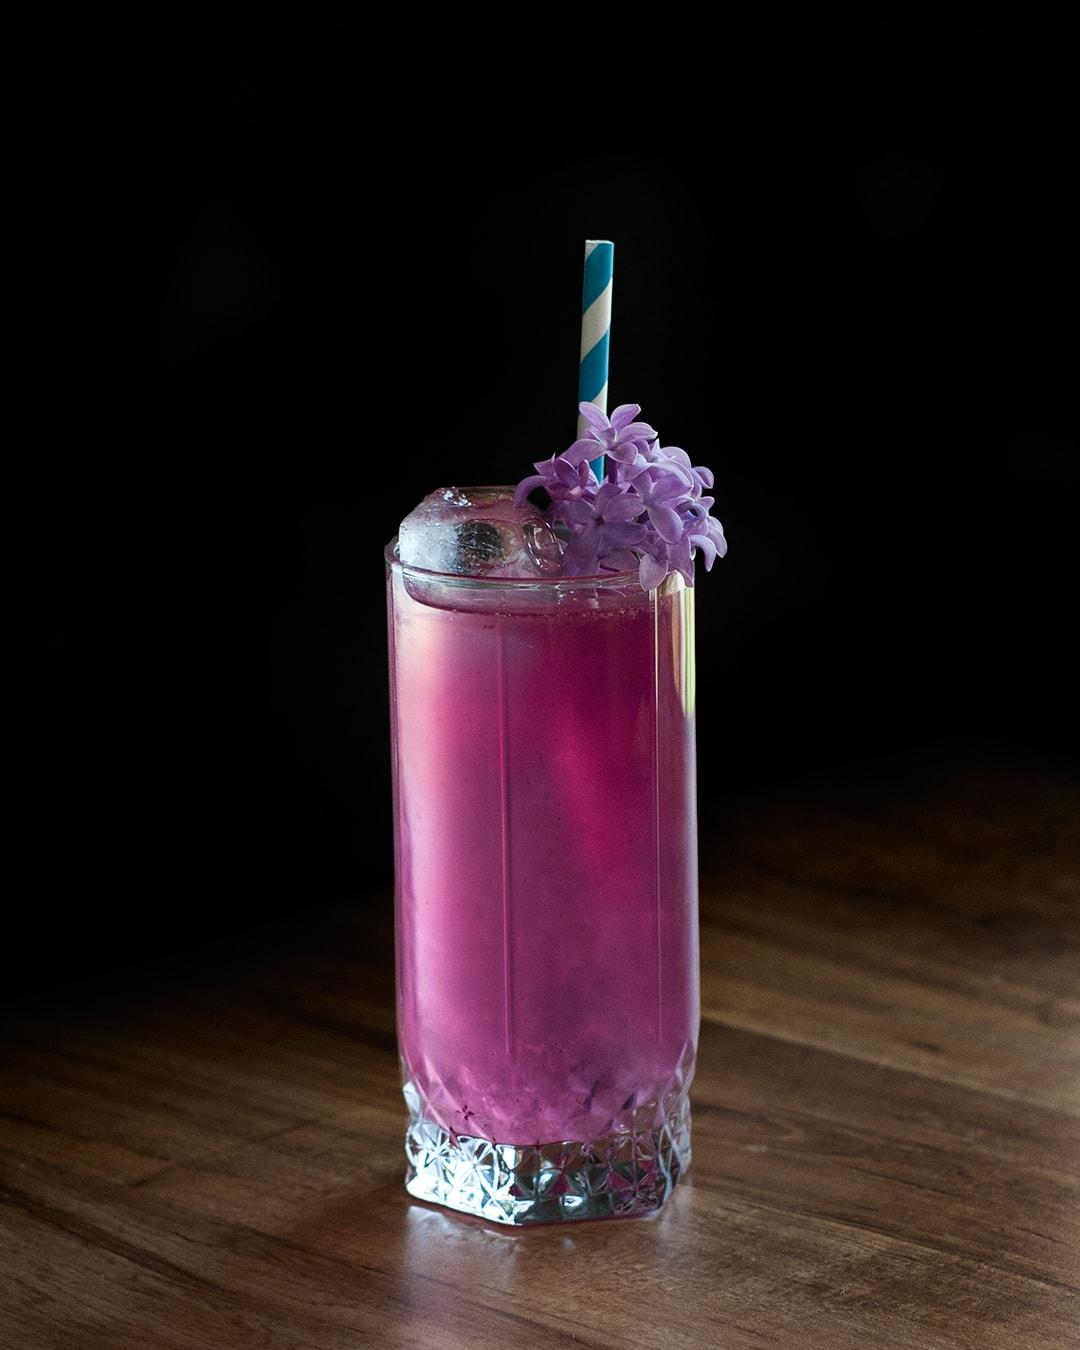 lilac gin lemonade cocktail